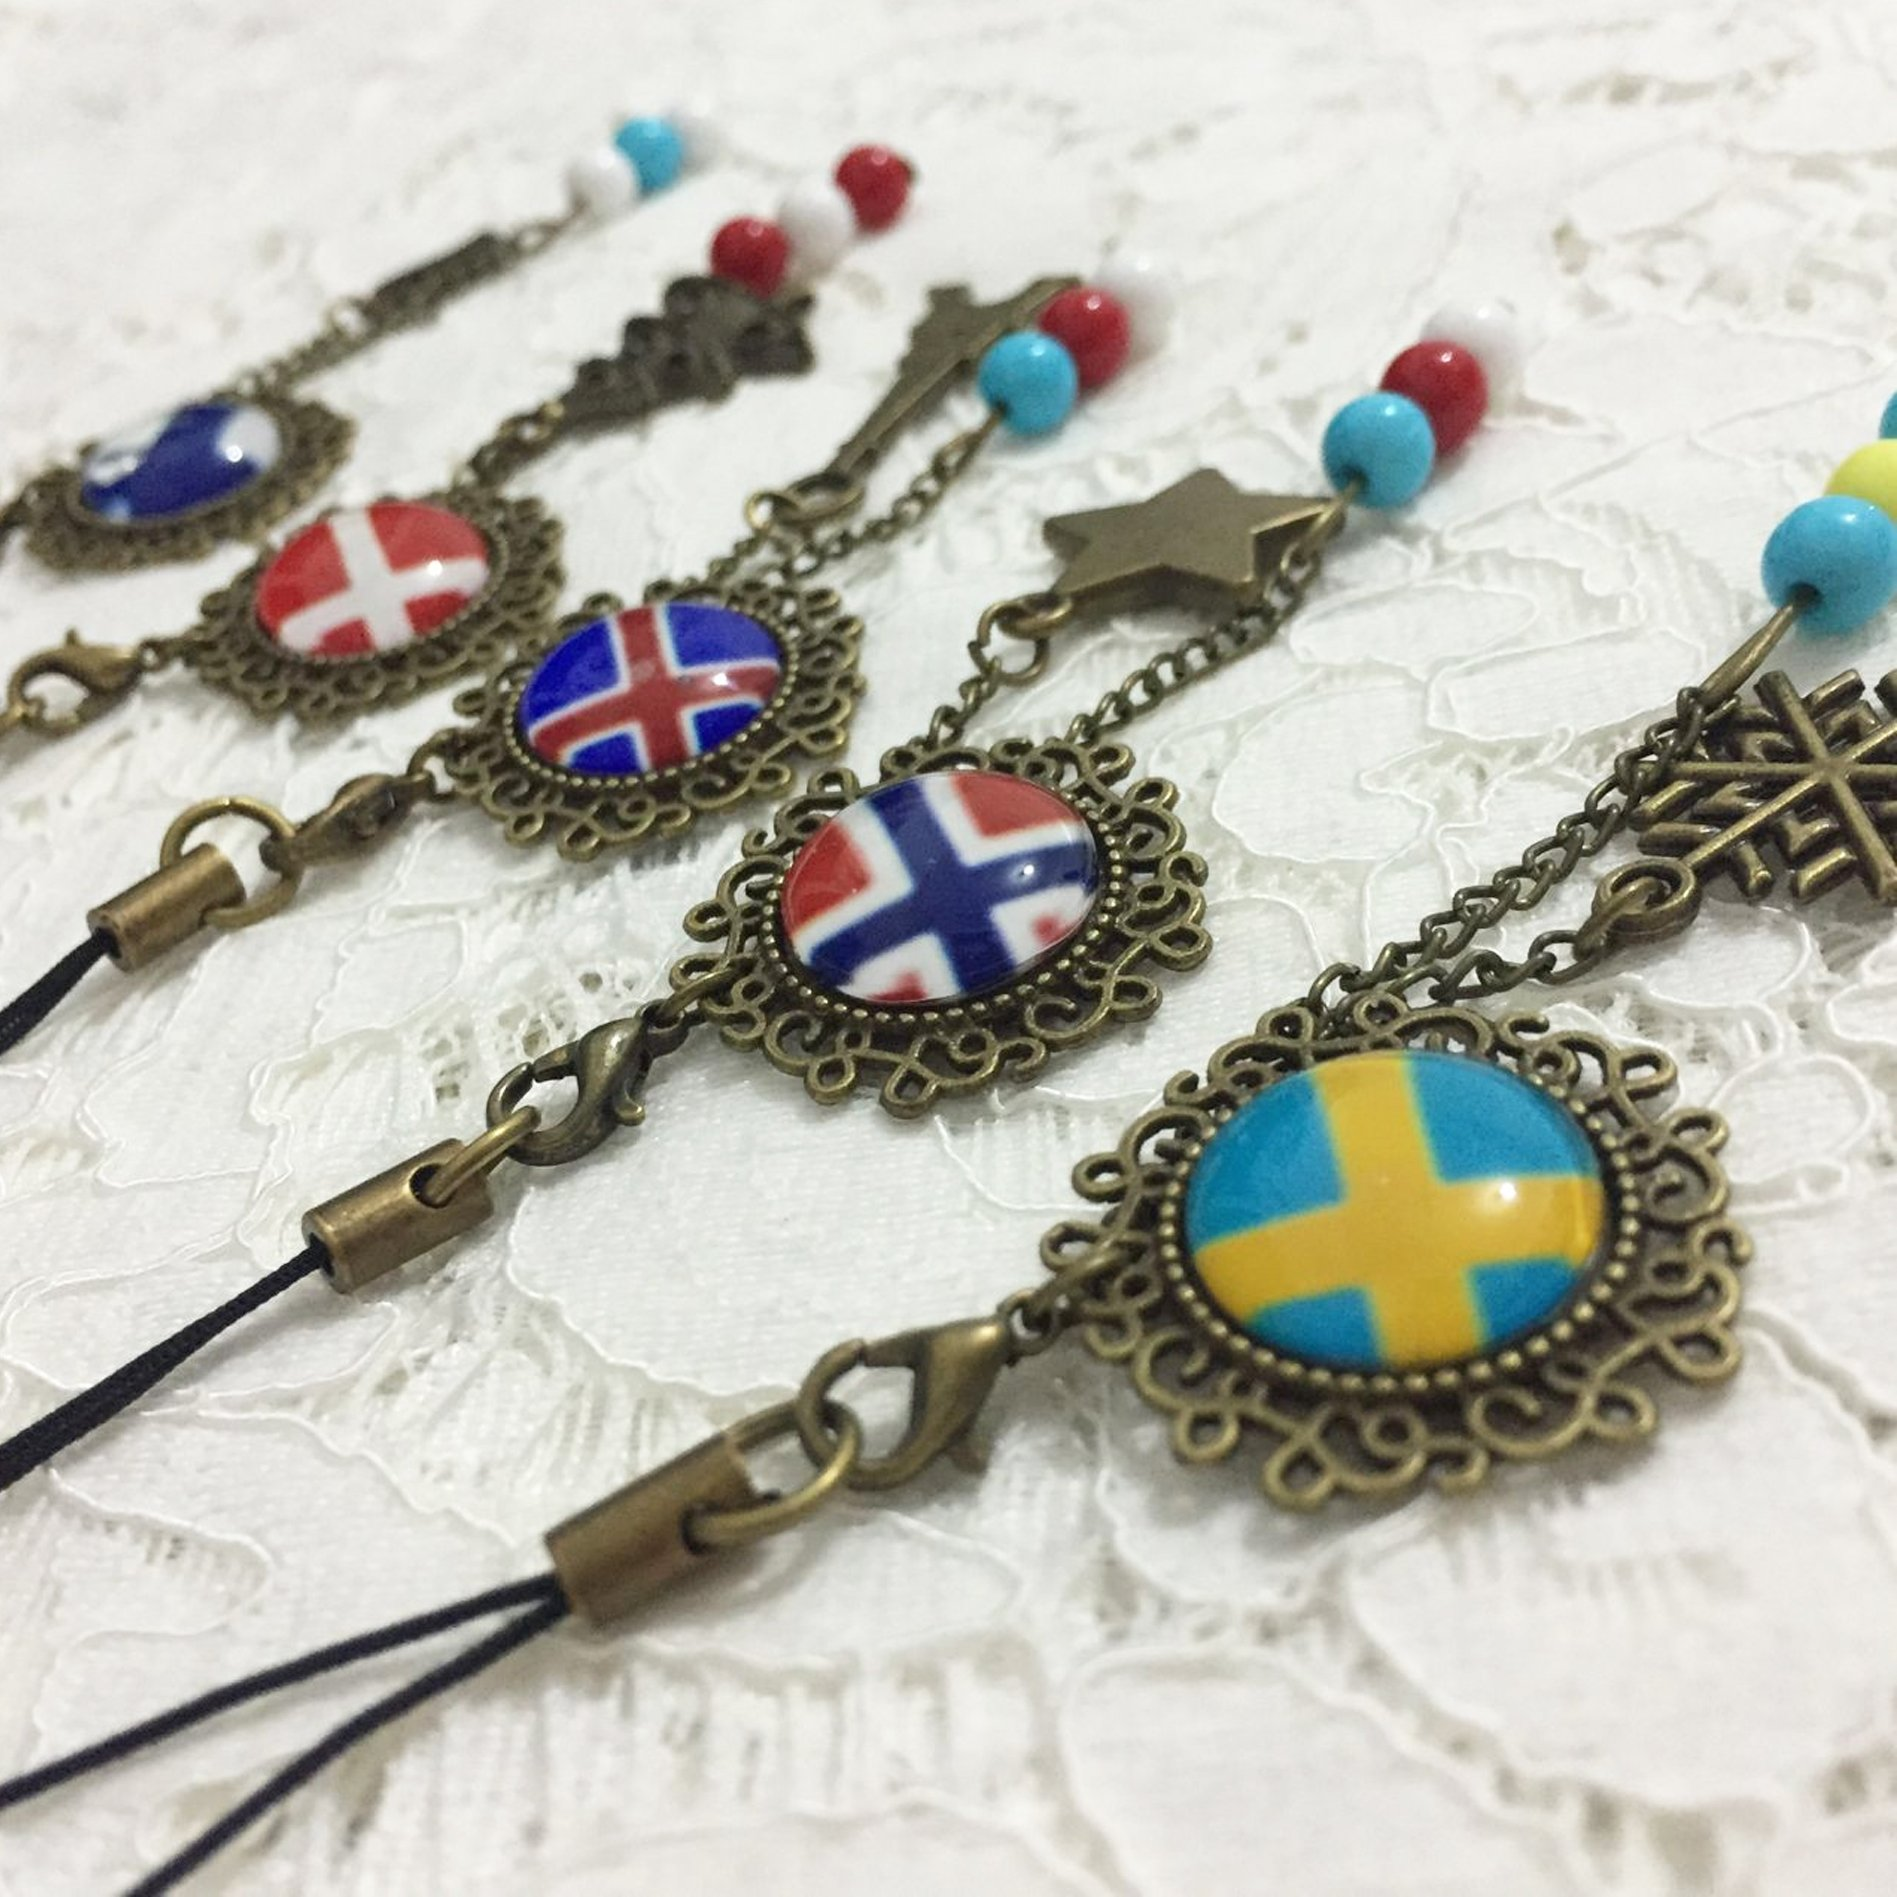 Dreamcosplay Axis Powers Hetalia Nordic Logo 5PCS Key chains Pendants Cosplay